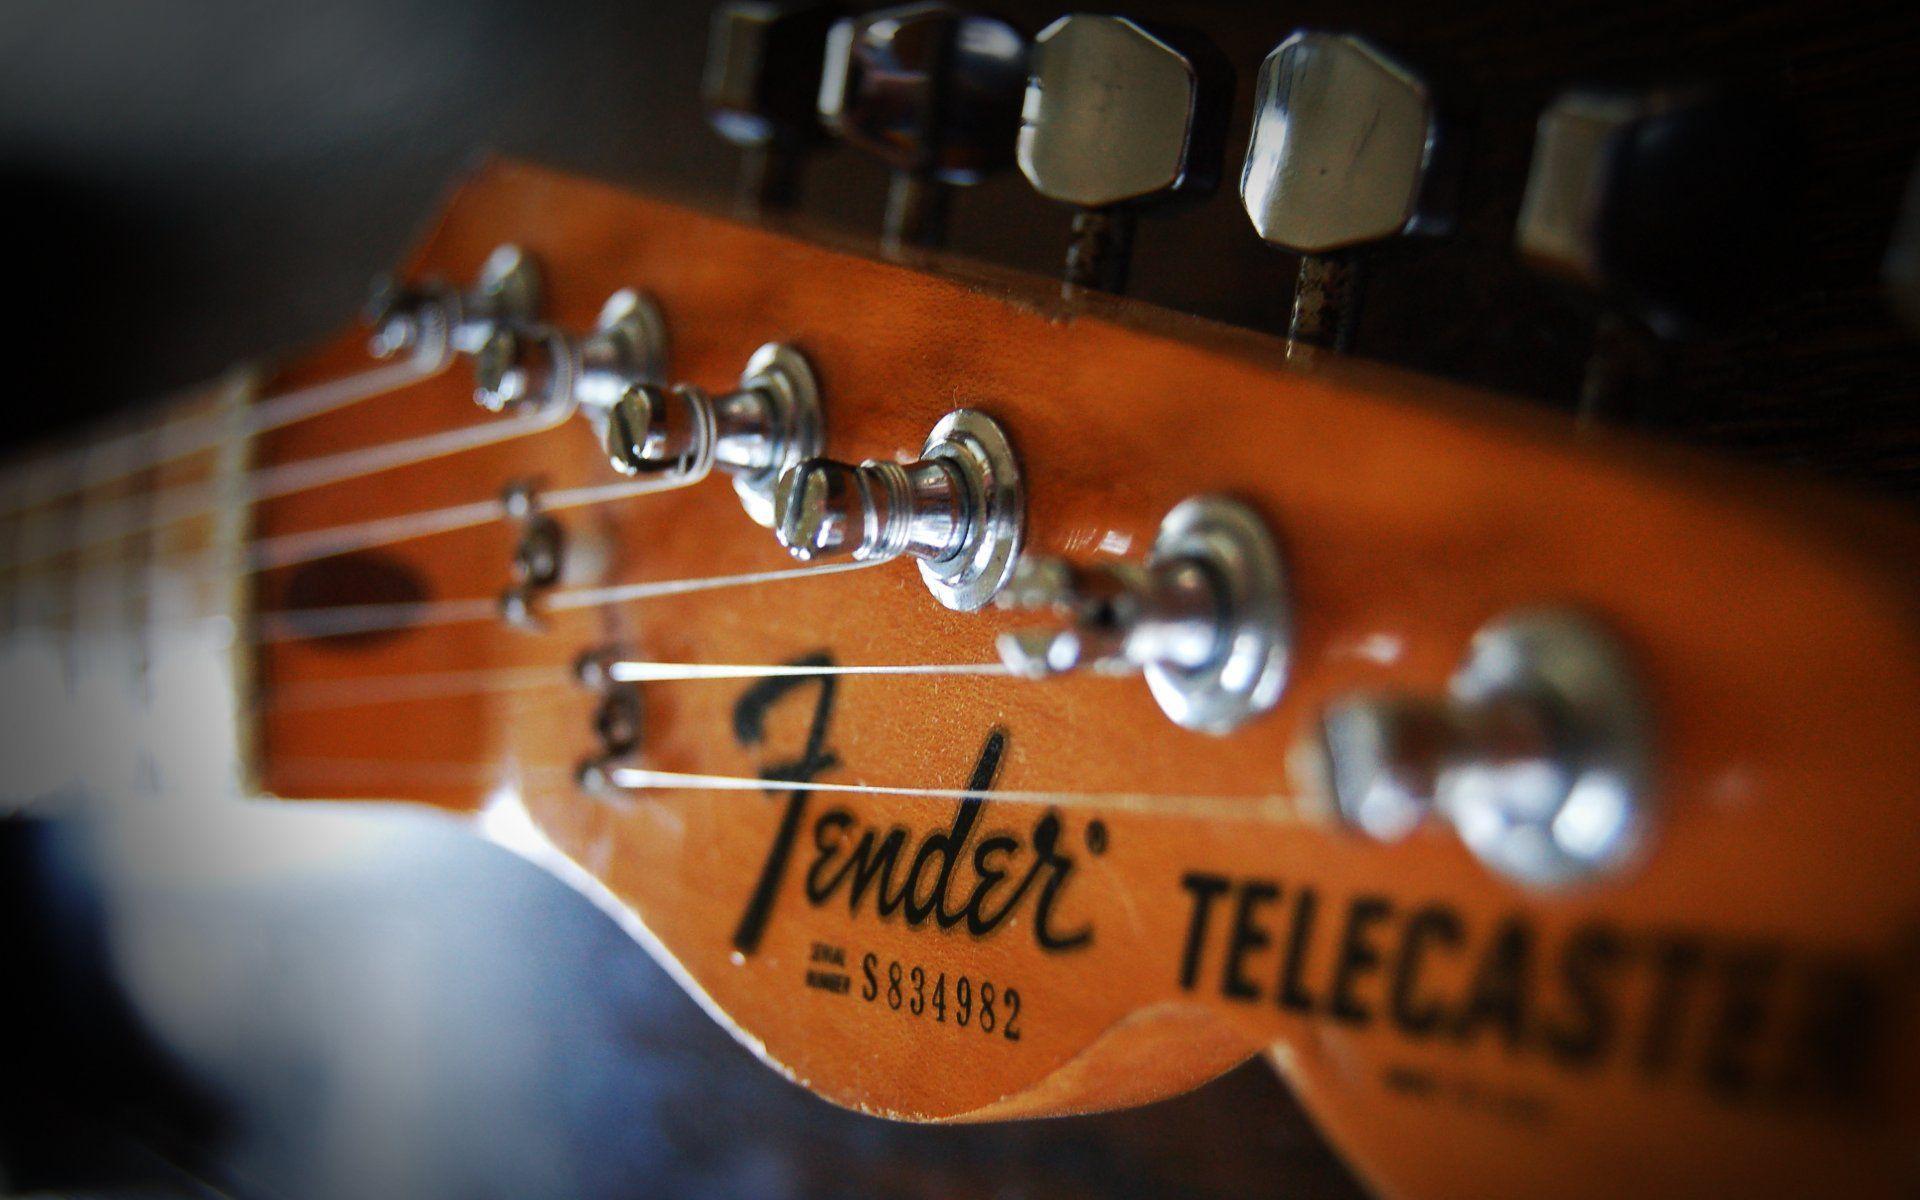 Fender Telecaster Wallpapers 1920x1200